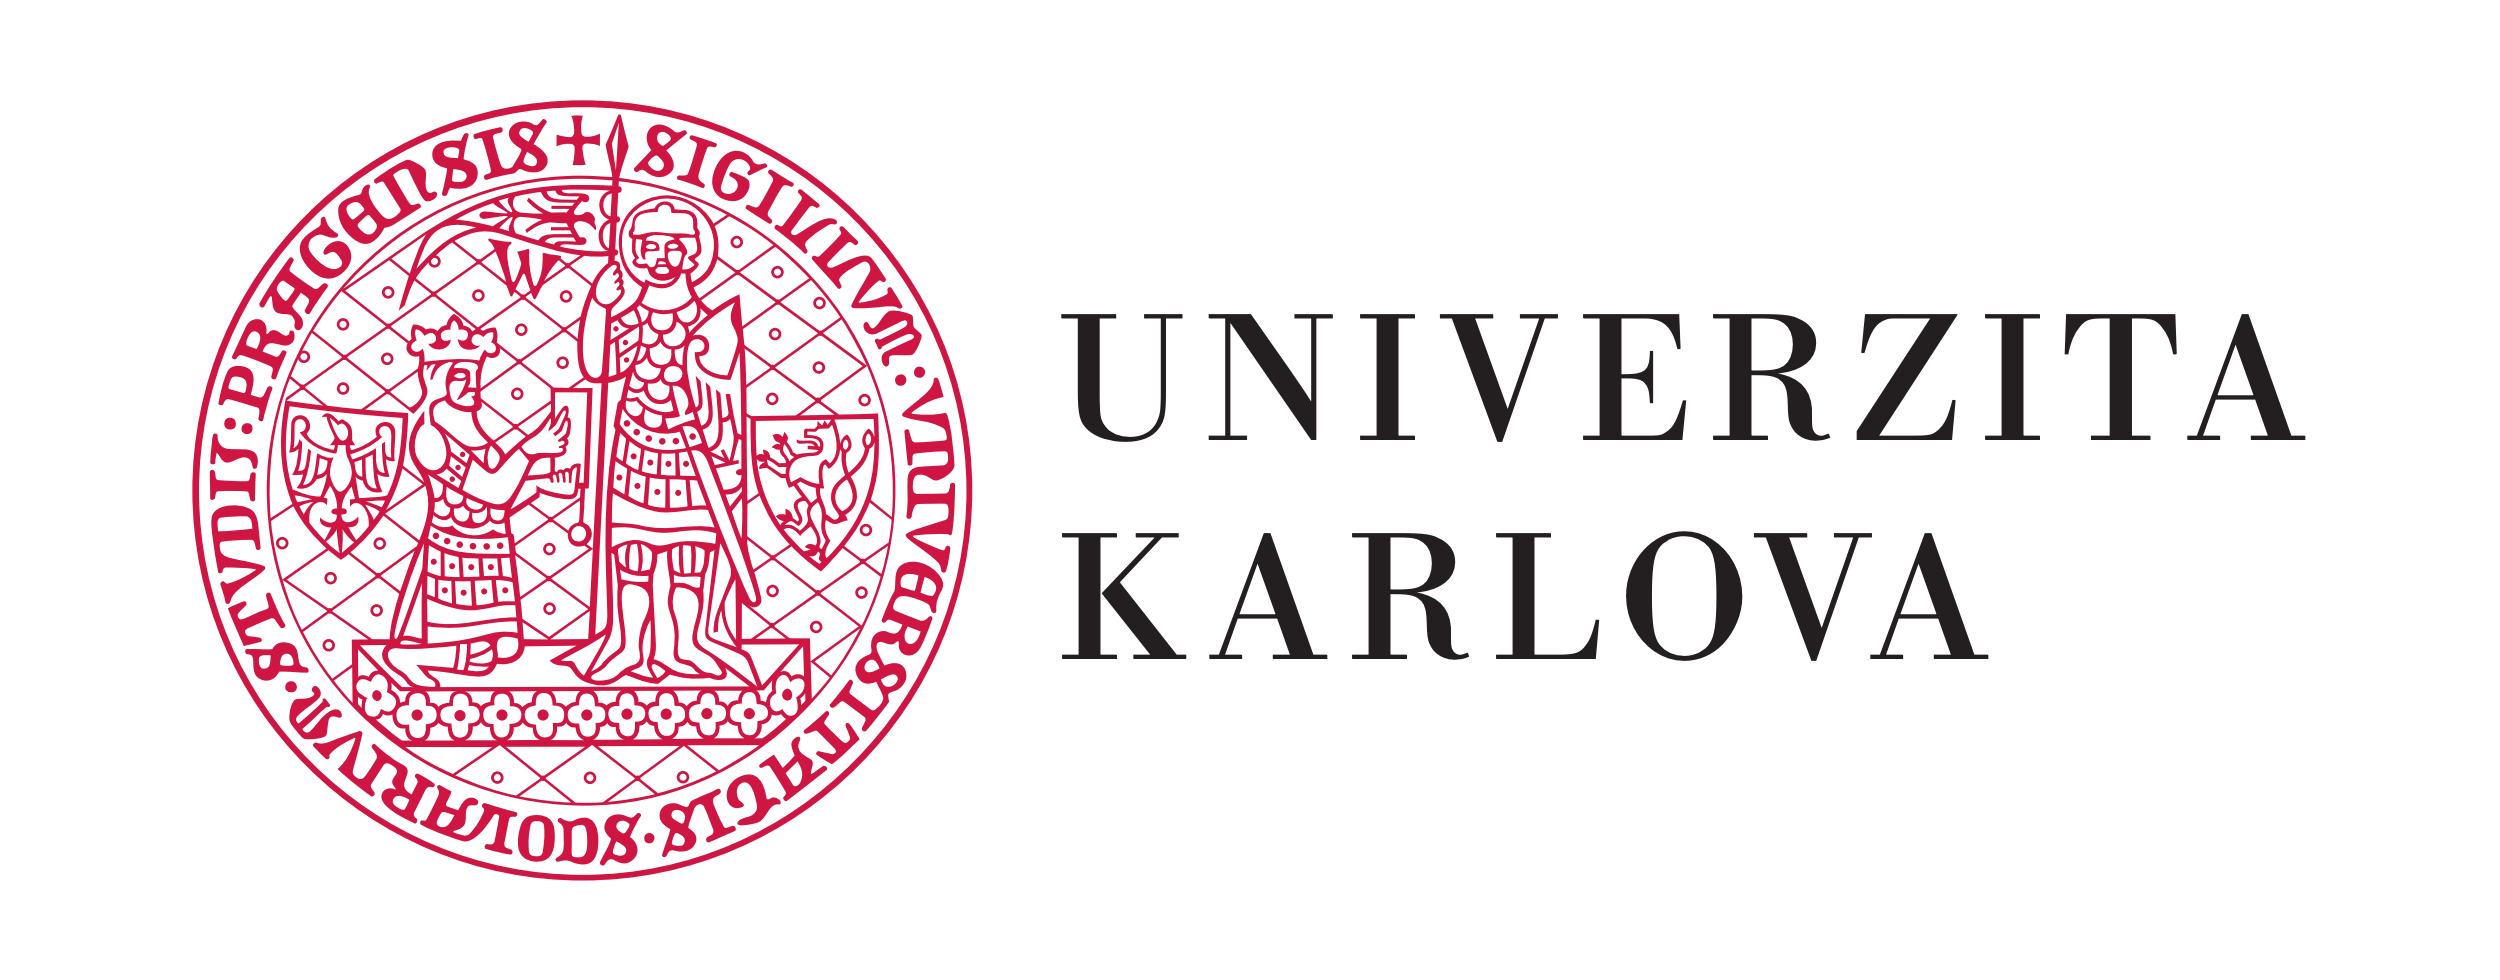 charles-university-31384382